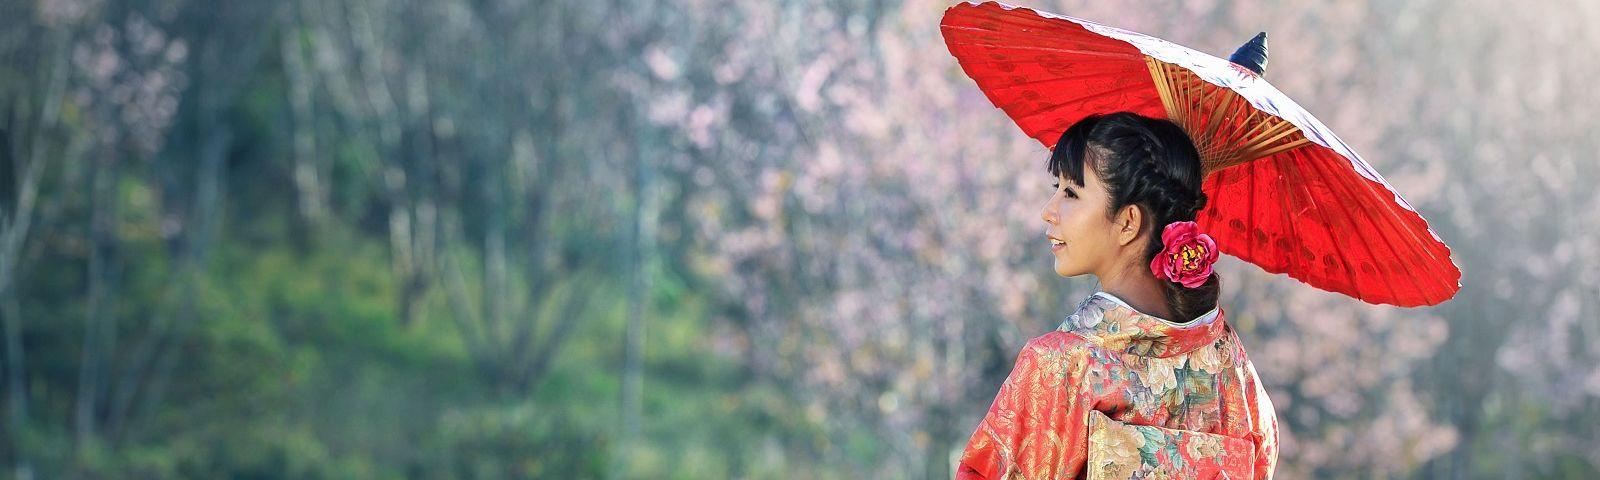 Enchanting Travels - Asian woman wearing traditional japanese kimono, sakura background - private tour of Japan